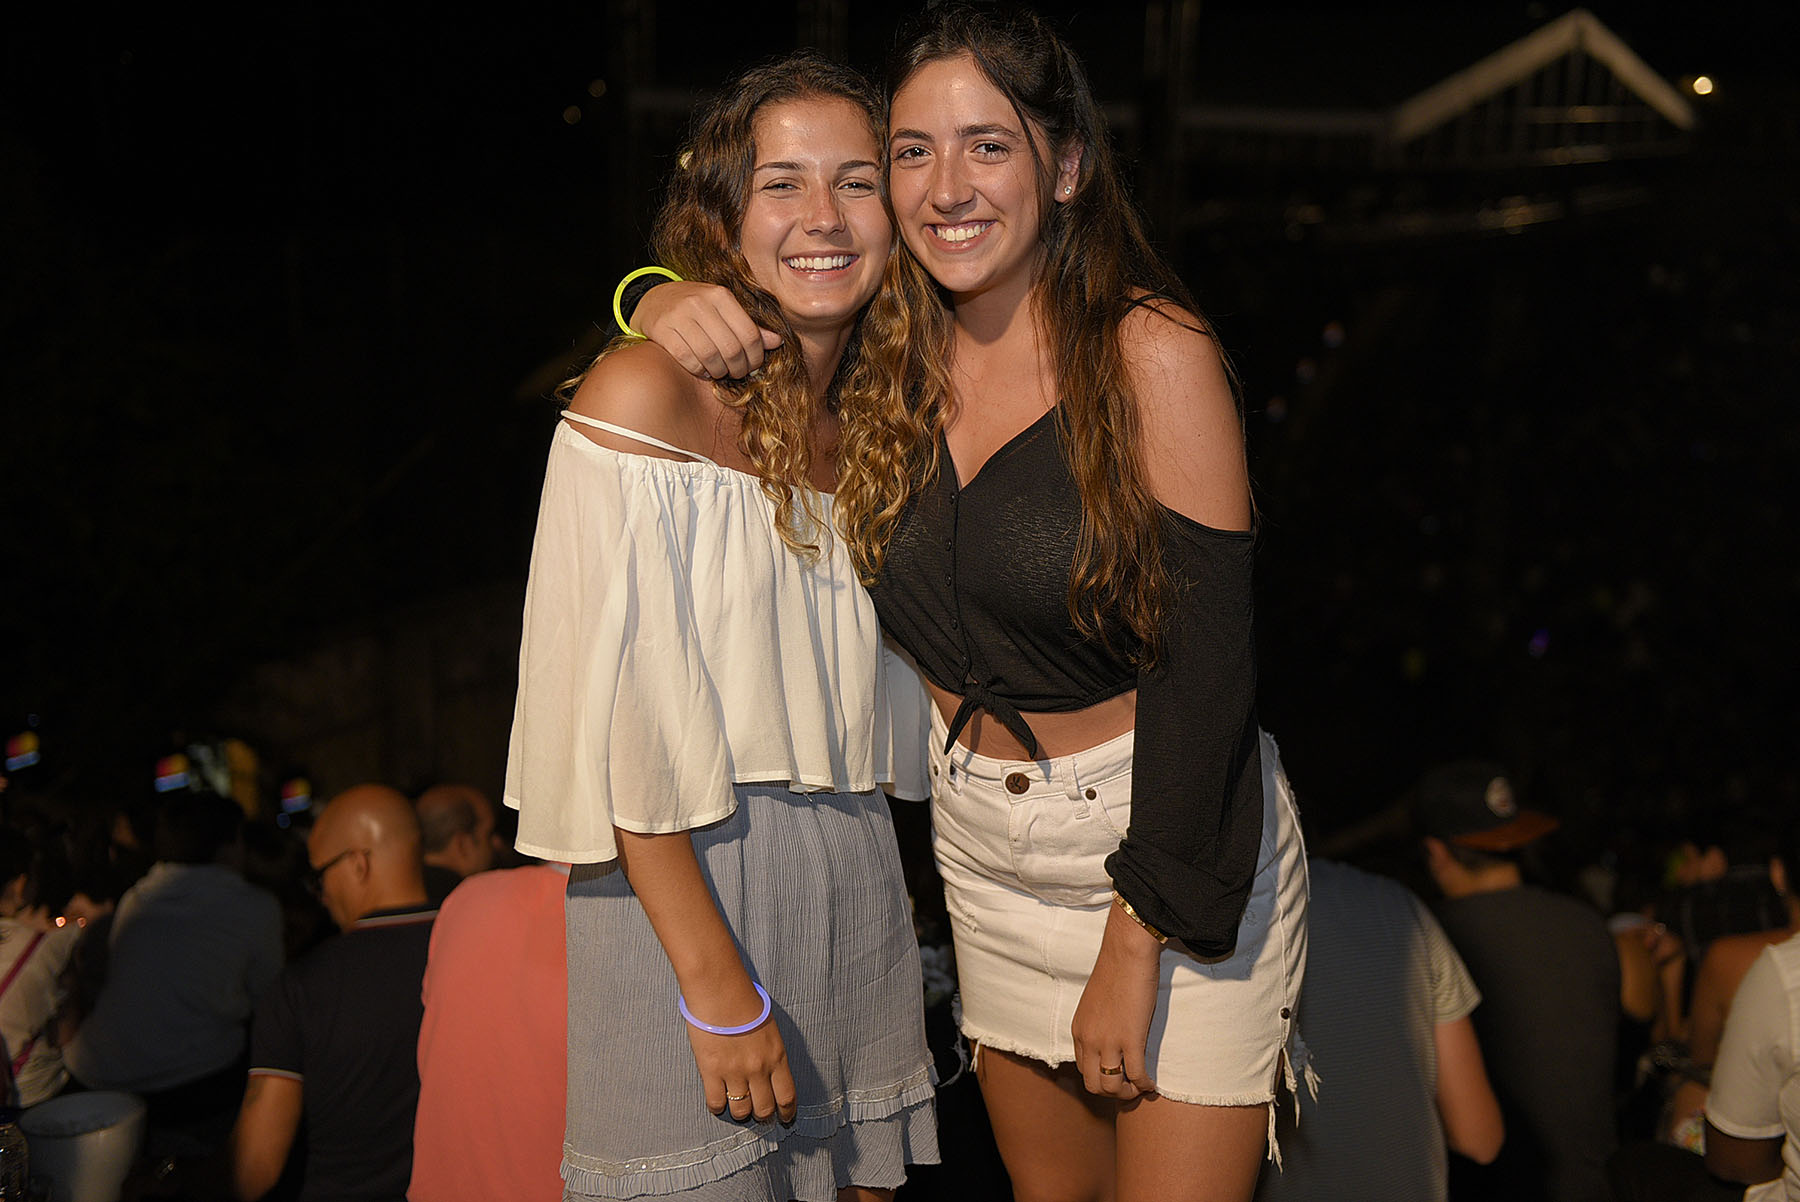 5. Laura Simo y Pia Miro Quesada